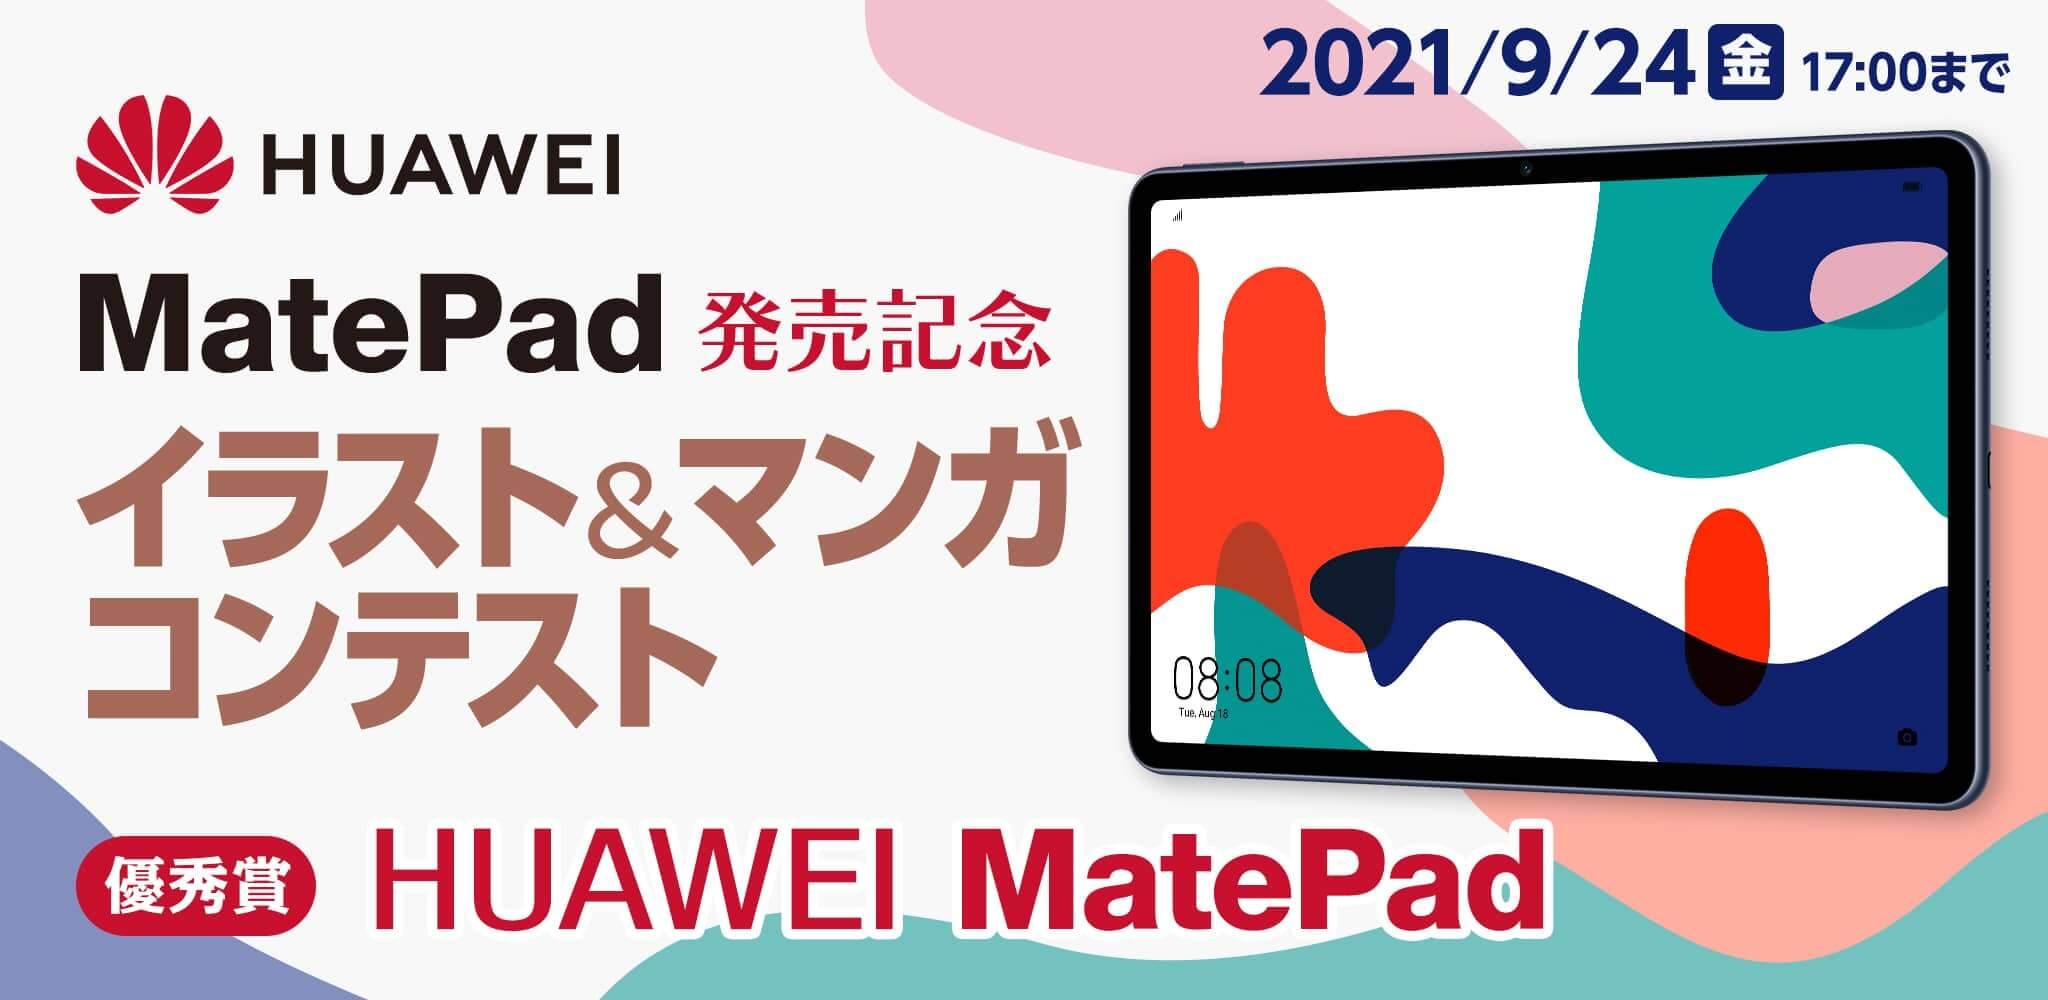 HUAWEI MatePad発売記念イラスト&マンガコンテスト